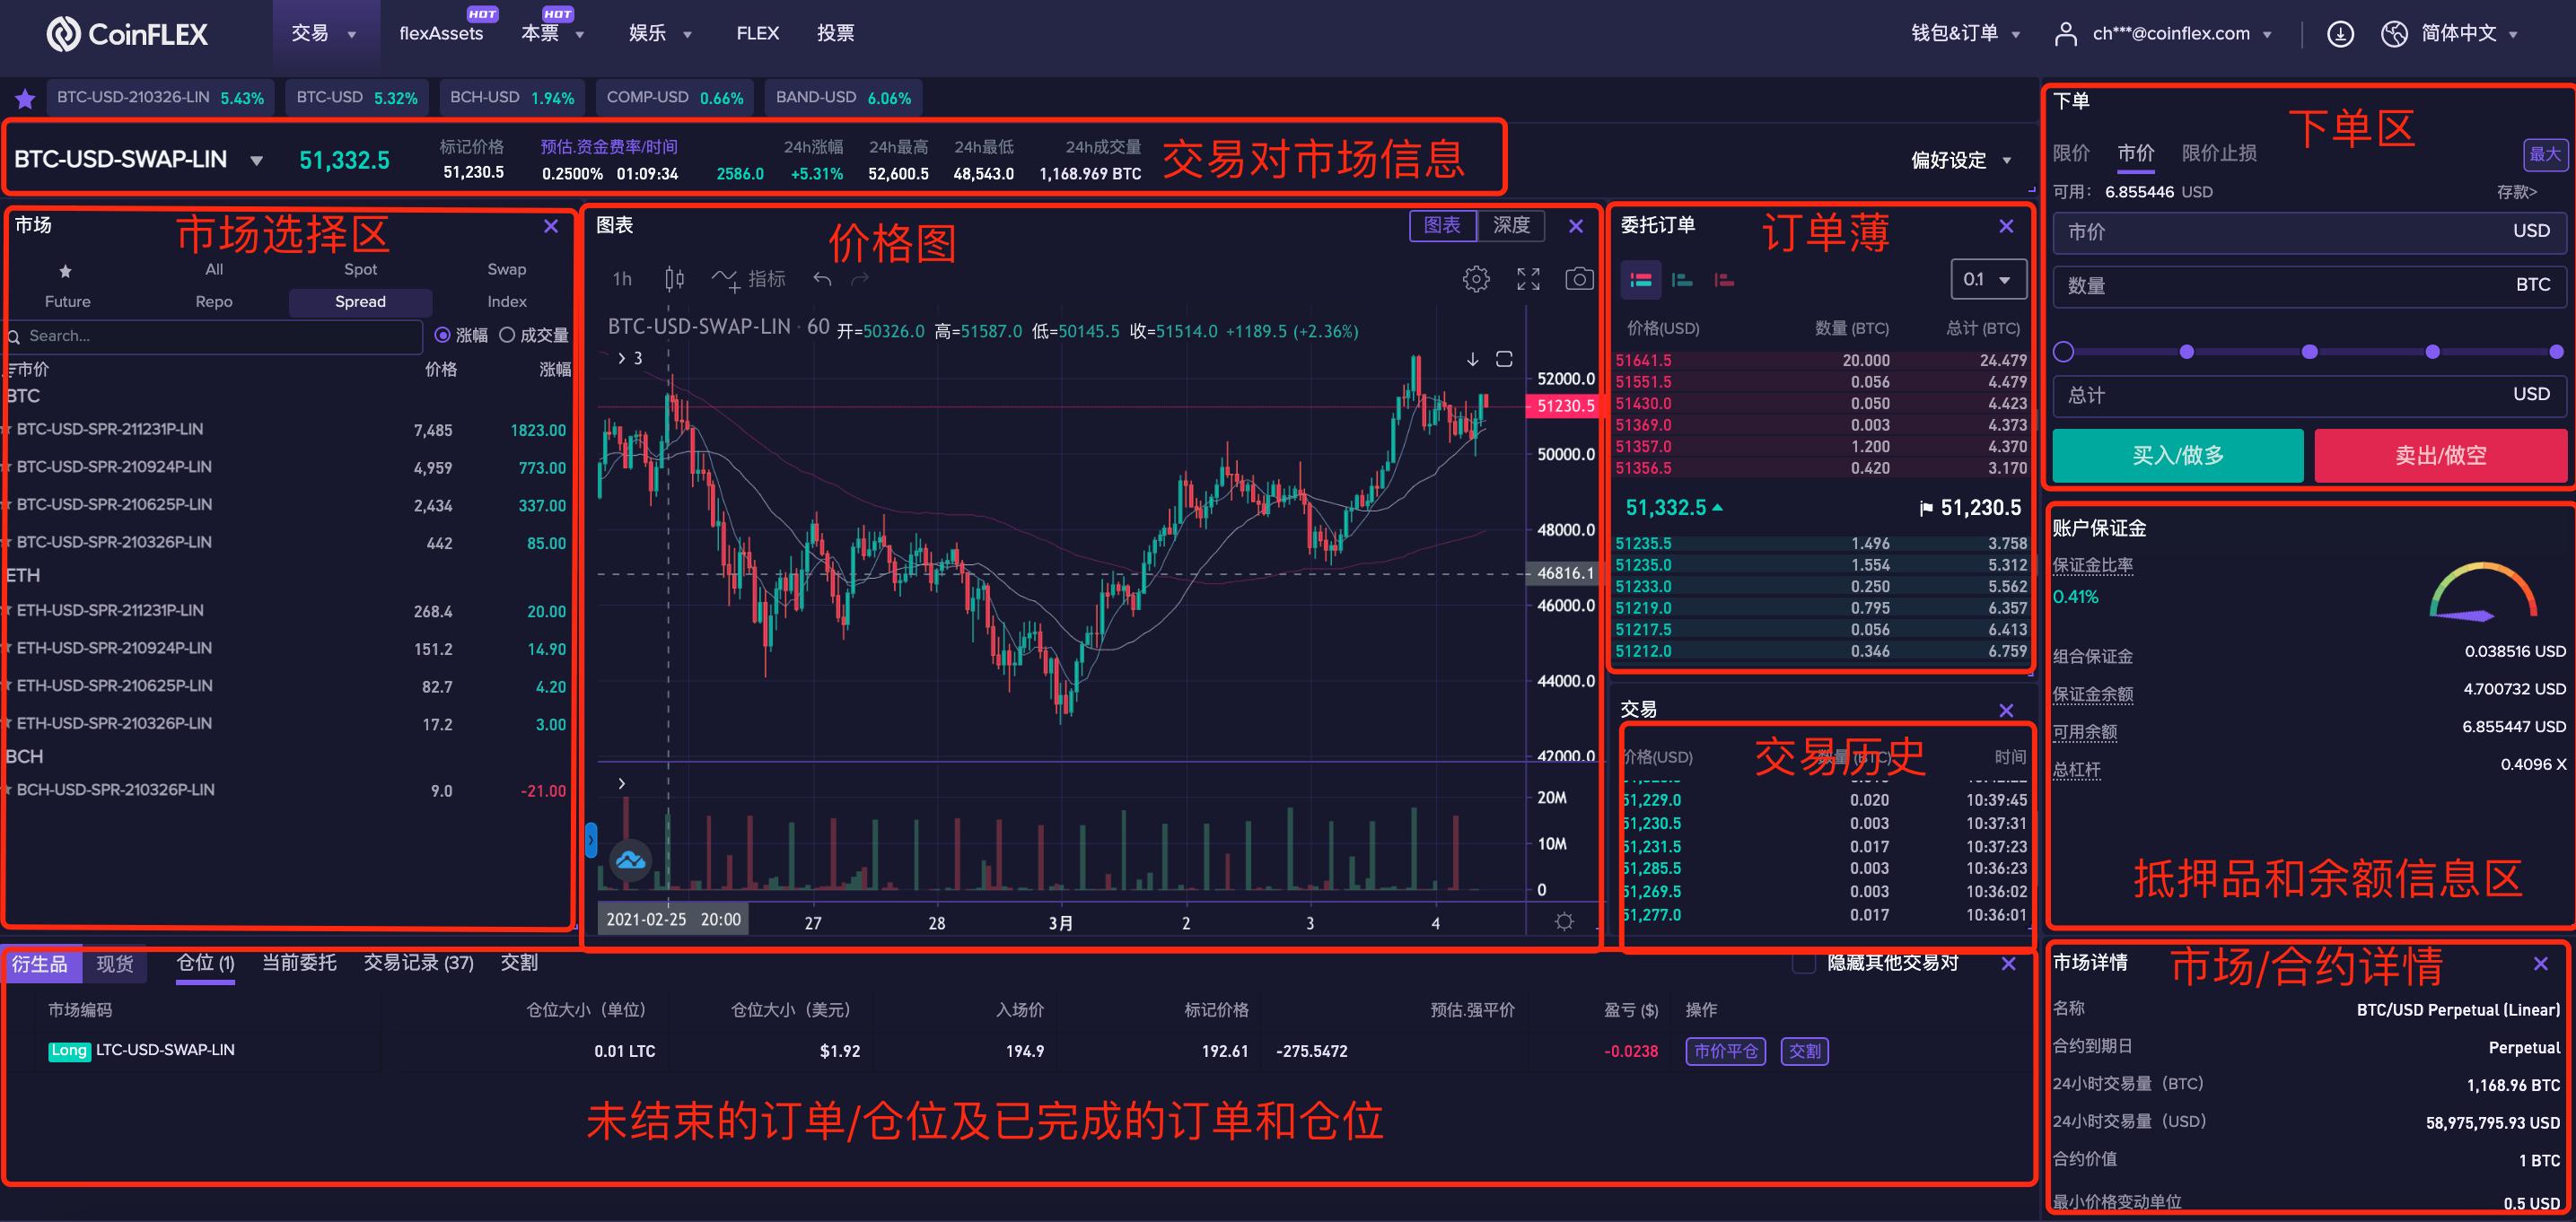 Trading UI1 2.1.1 Trading UI introduction